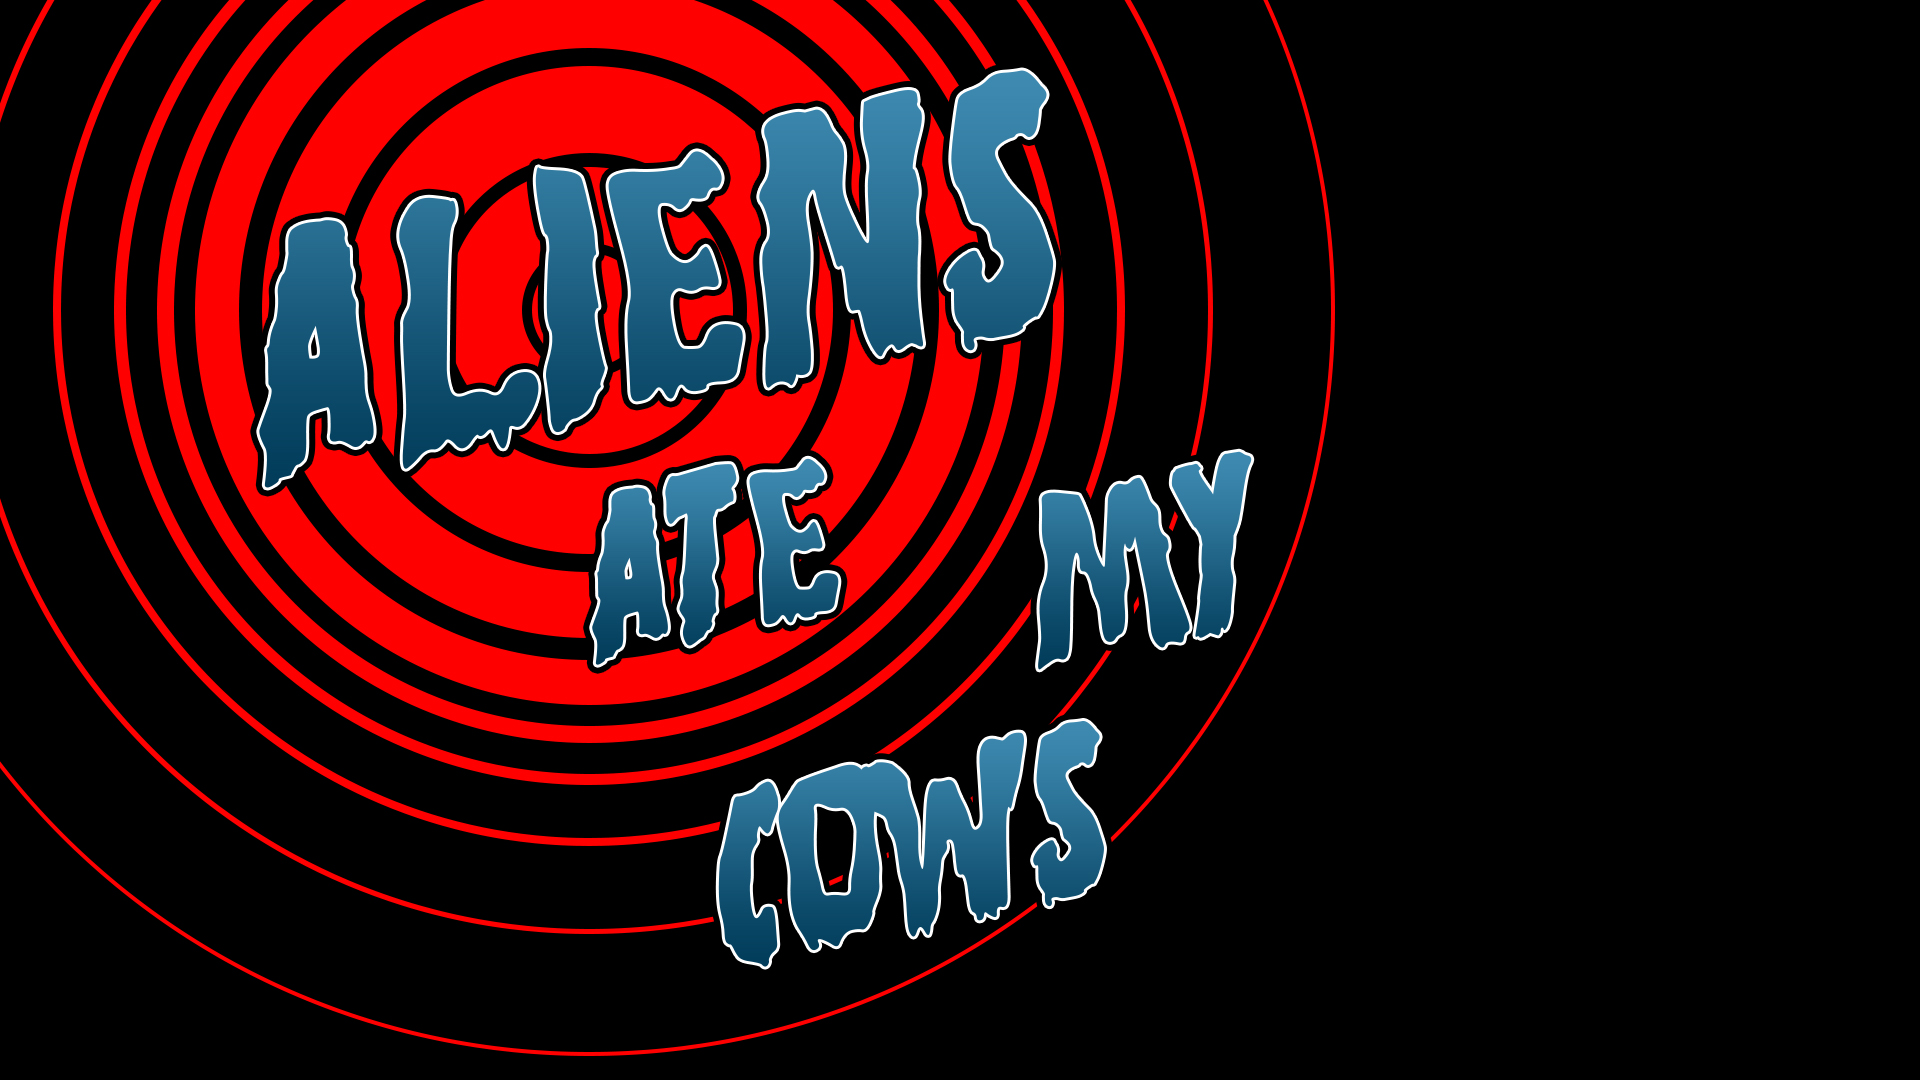 Aliens ate my cows